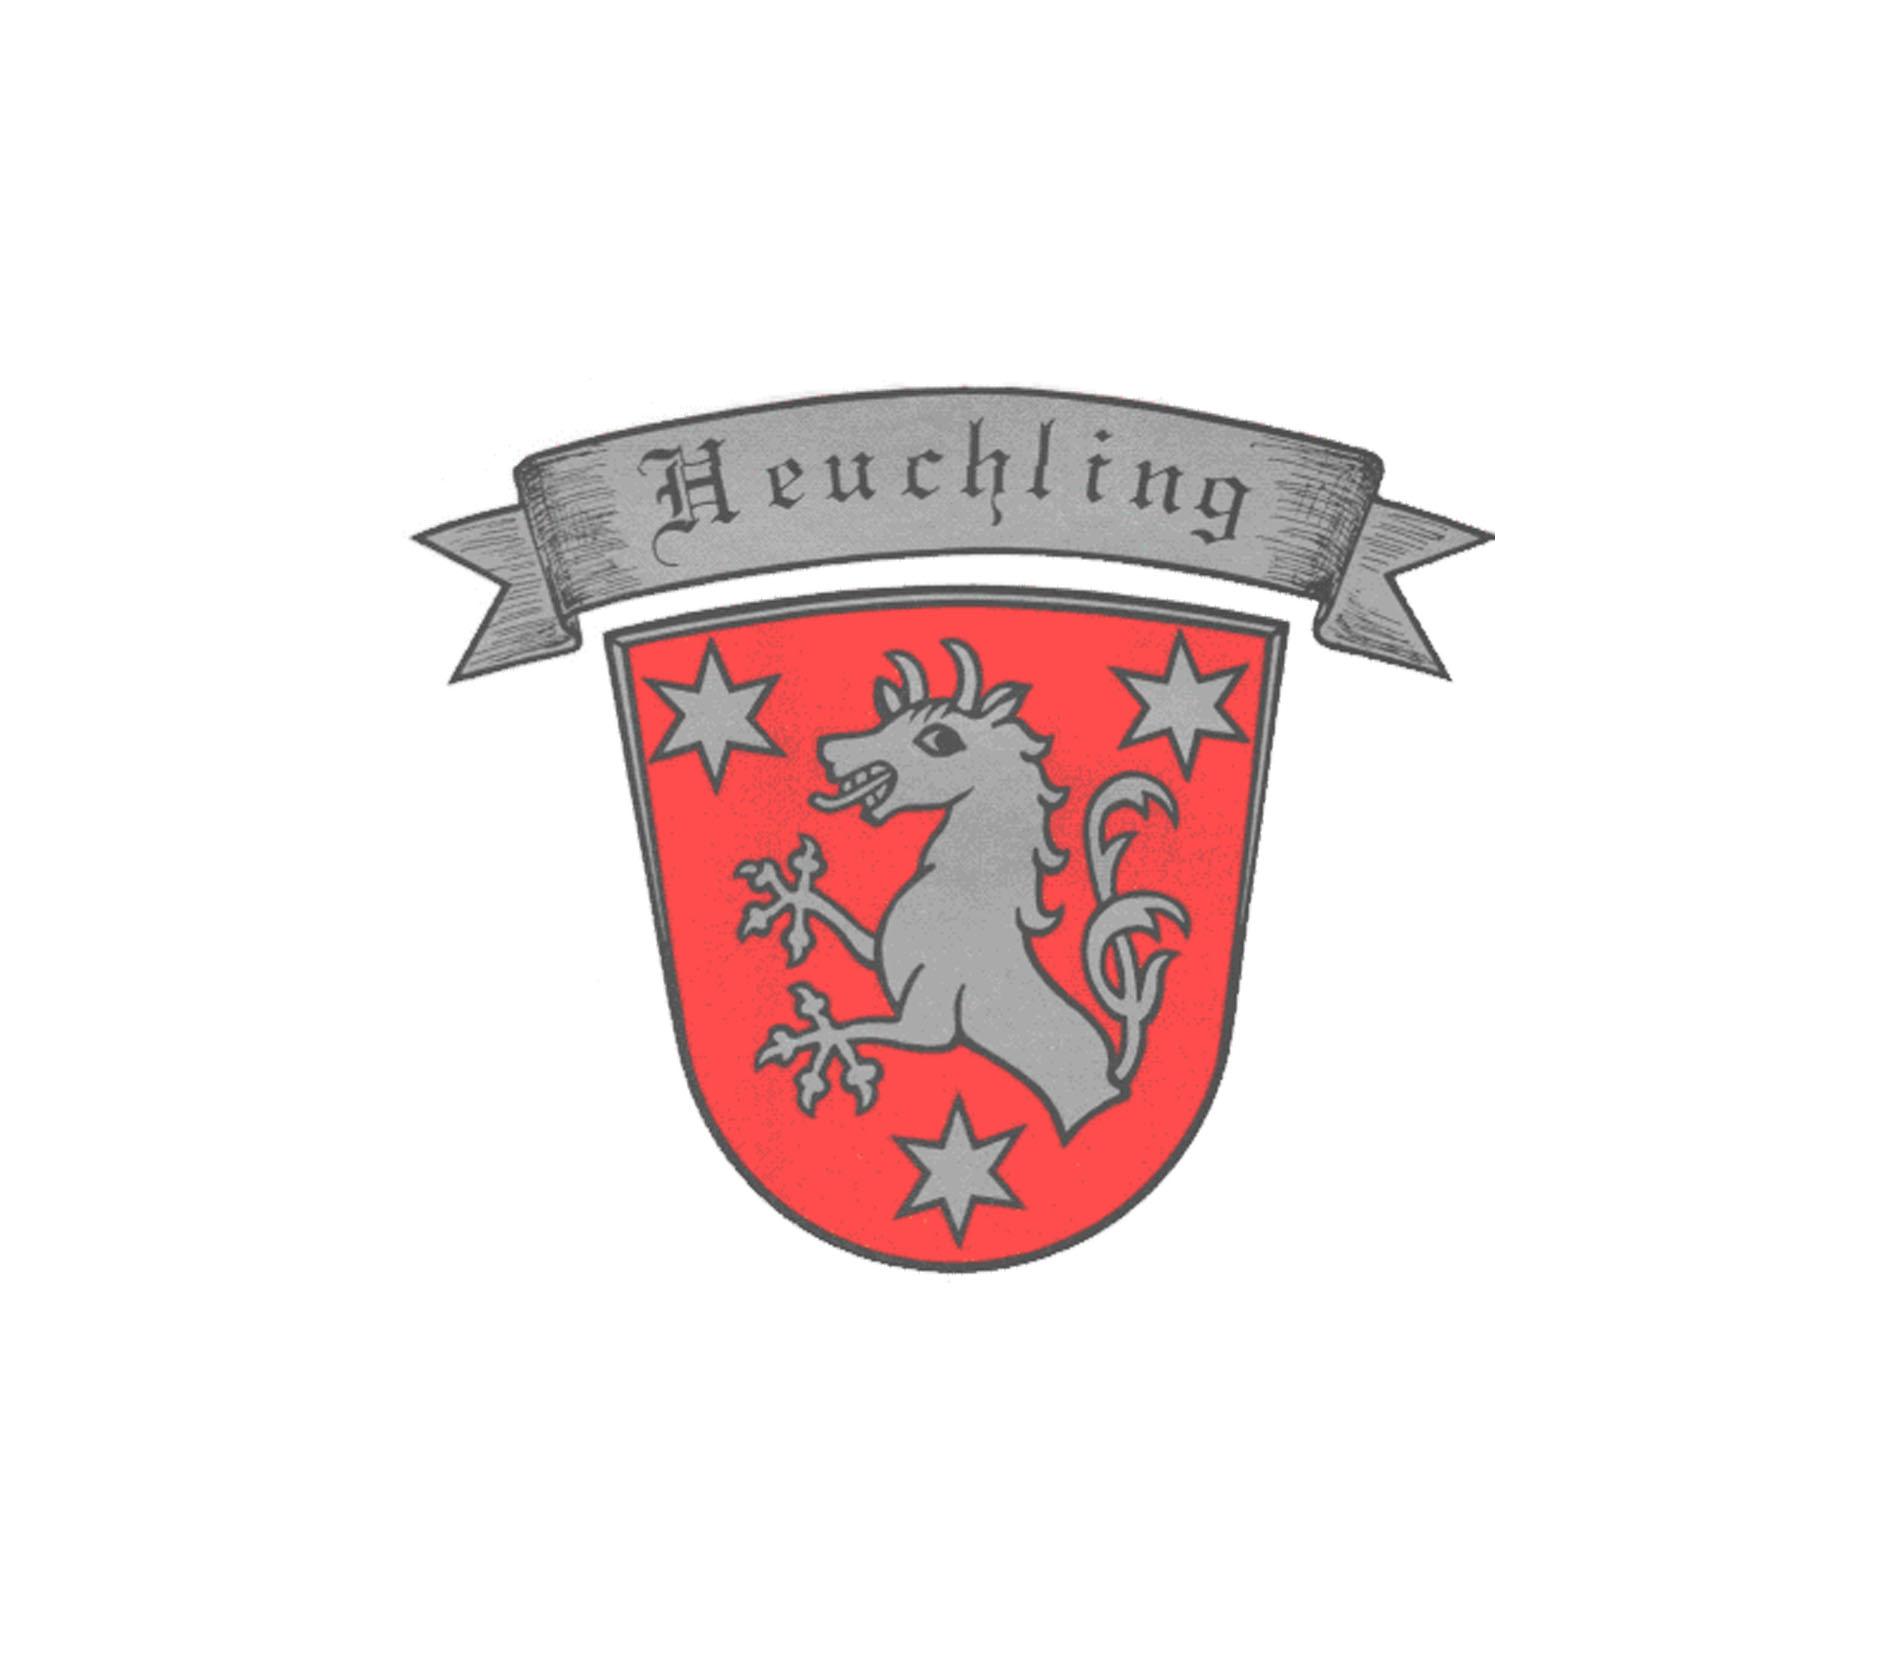 FF Heuchling